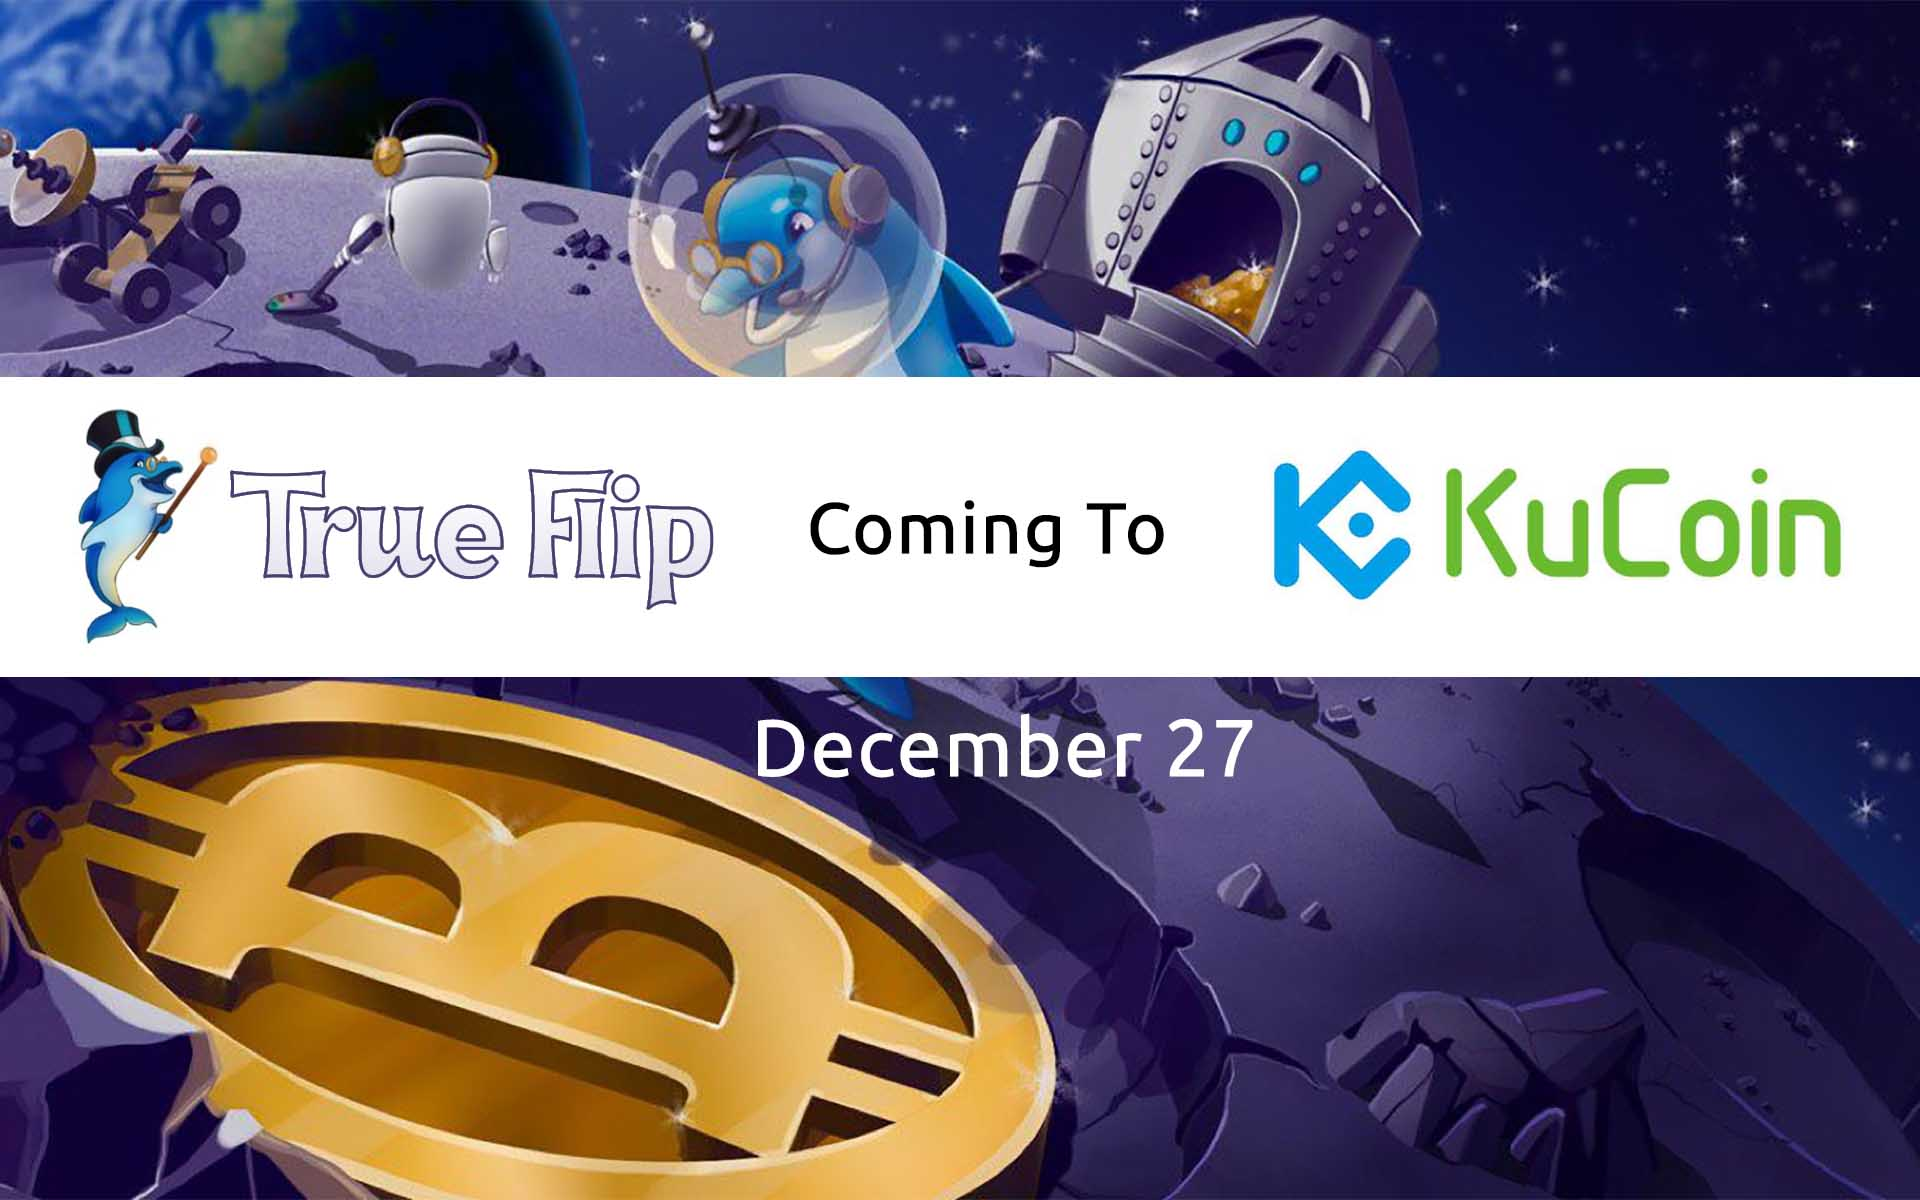 True Flip Trading Promotion On KuCoin: Trading Starts On December 27, 39,000 True Flip in Prizes!